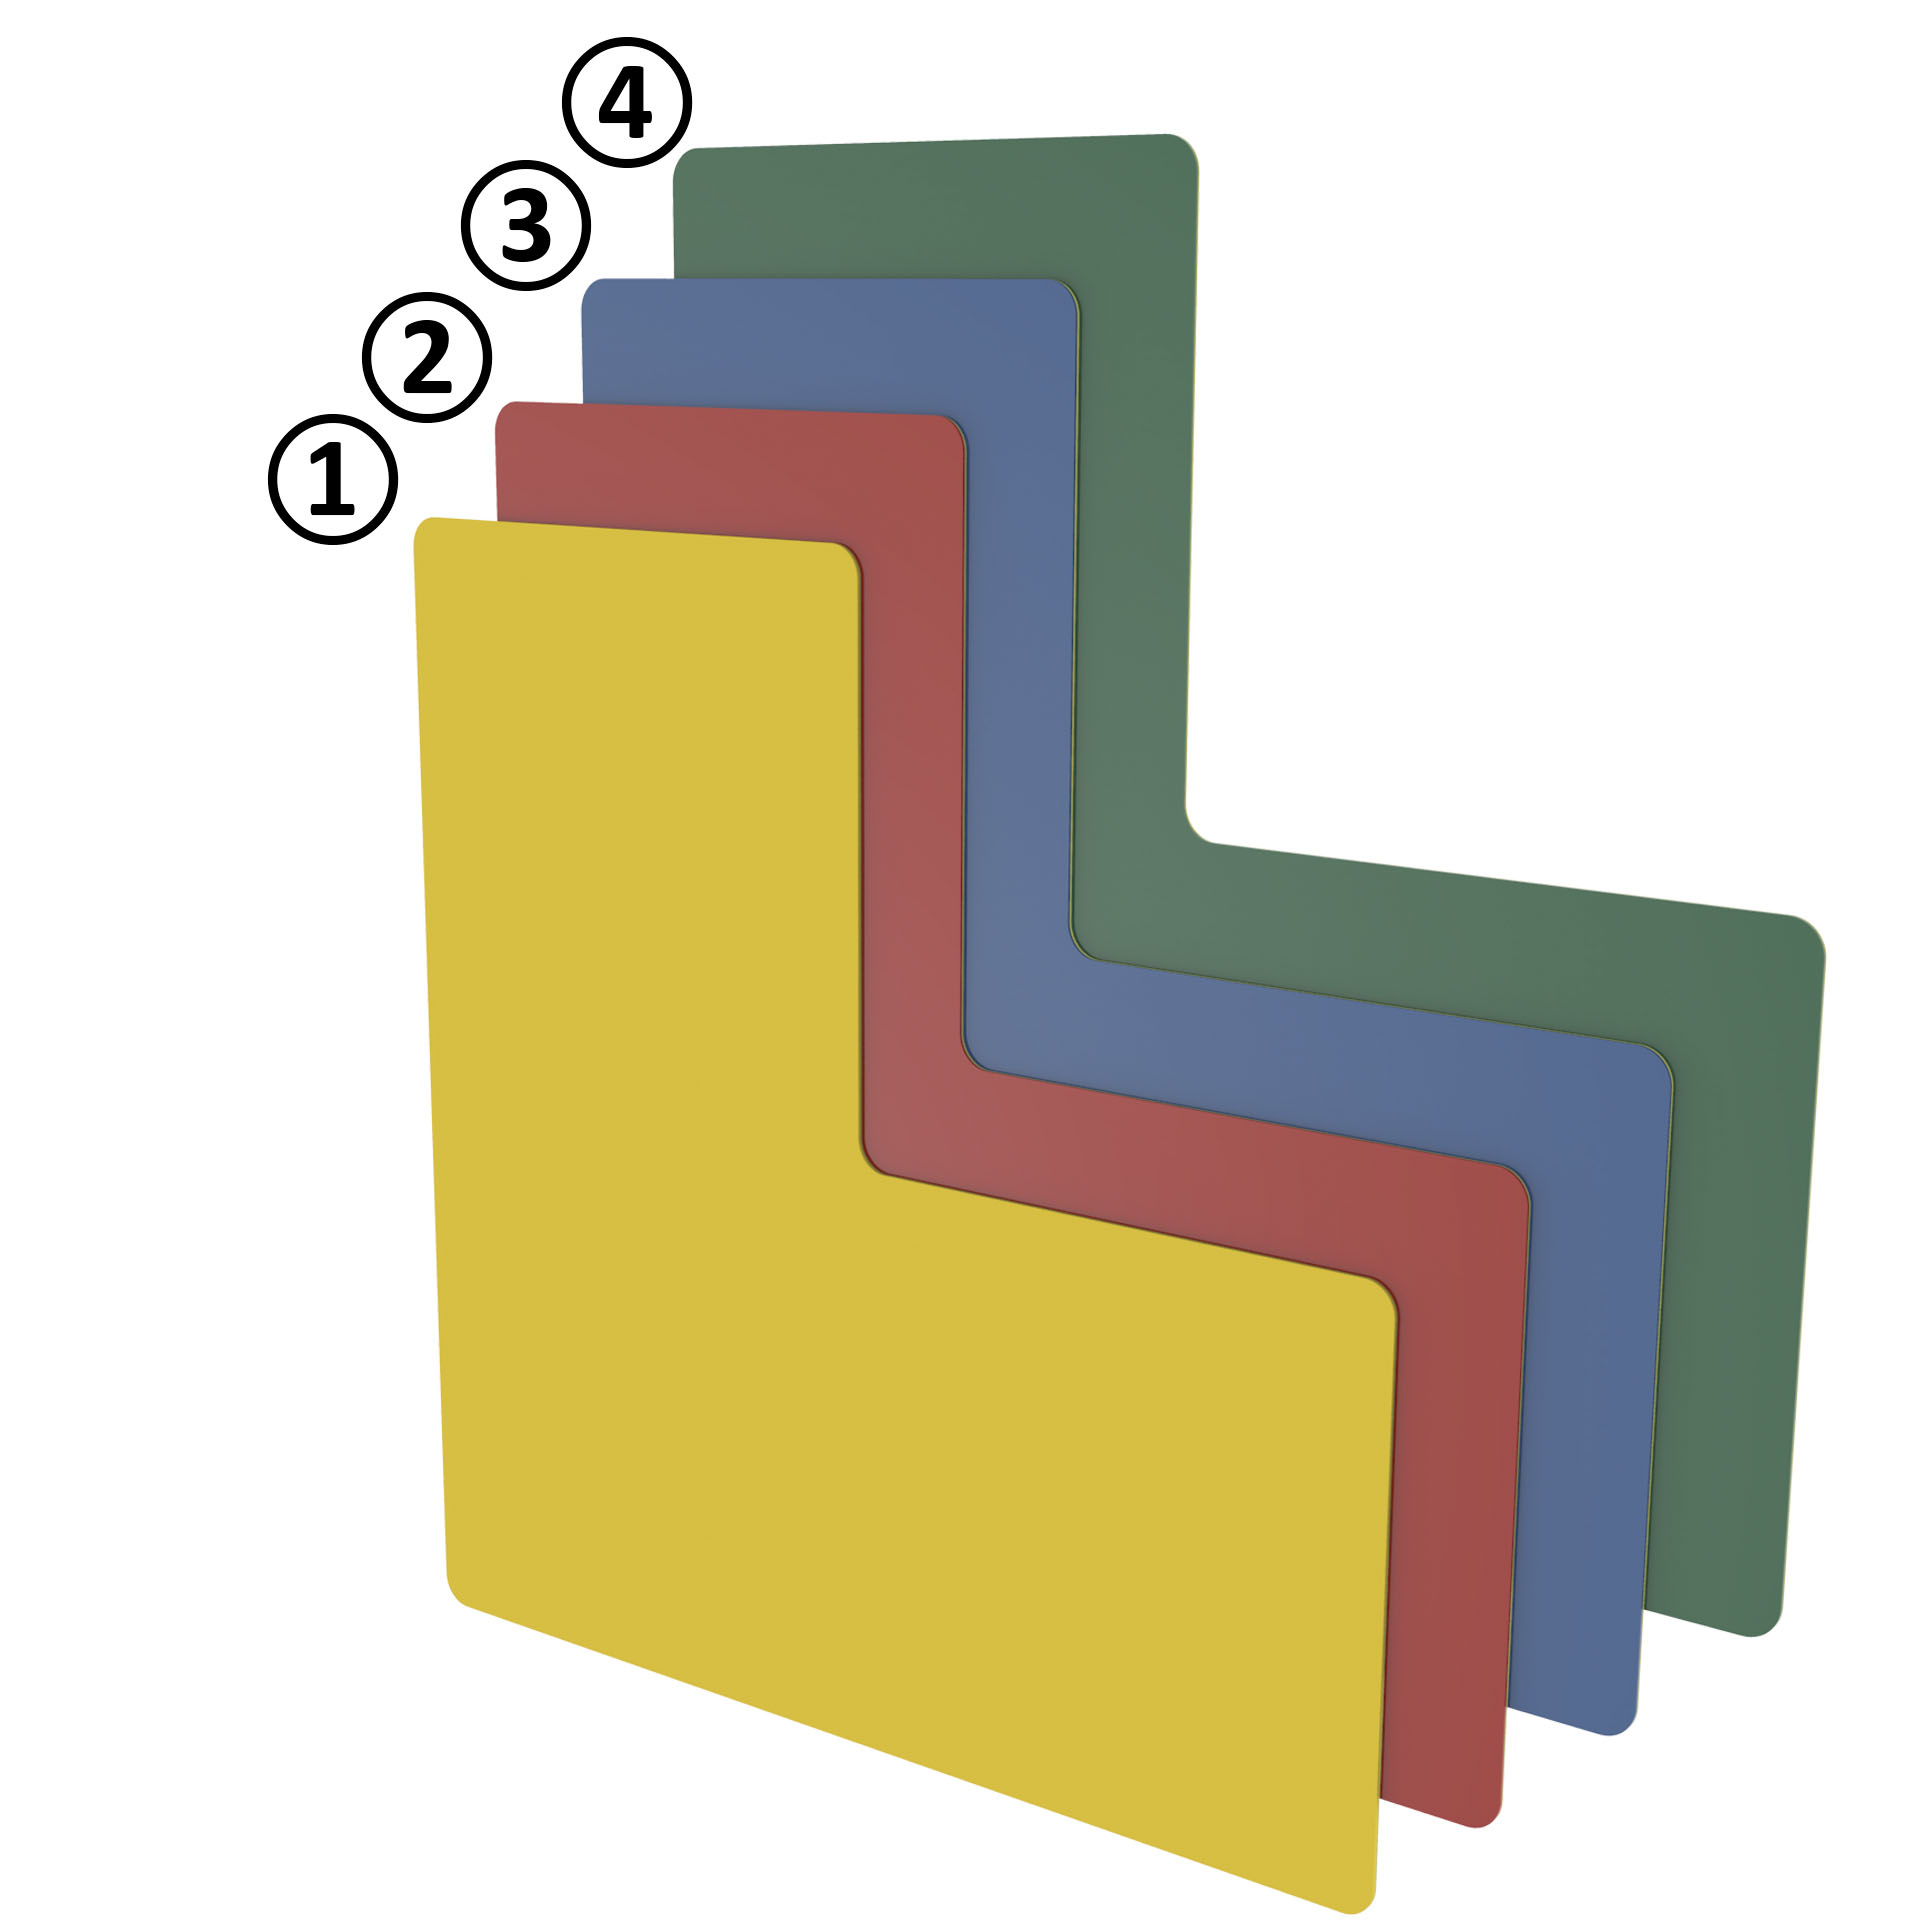 Bodenmarkierung L-Form 75 - blau